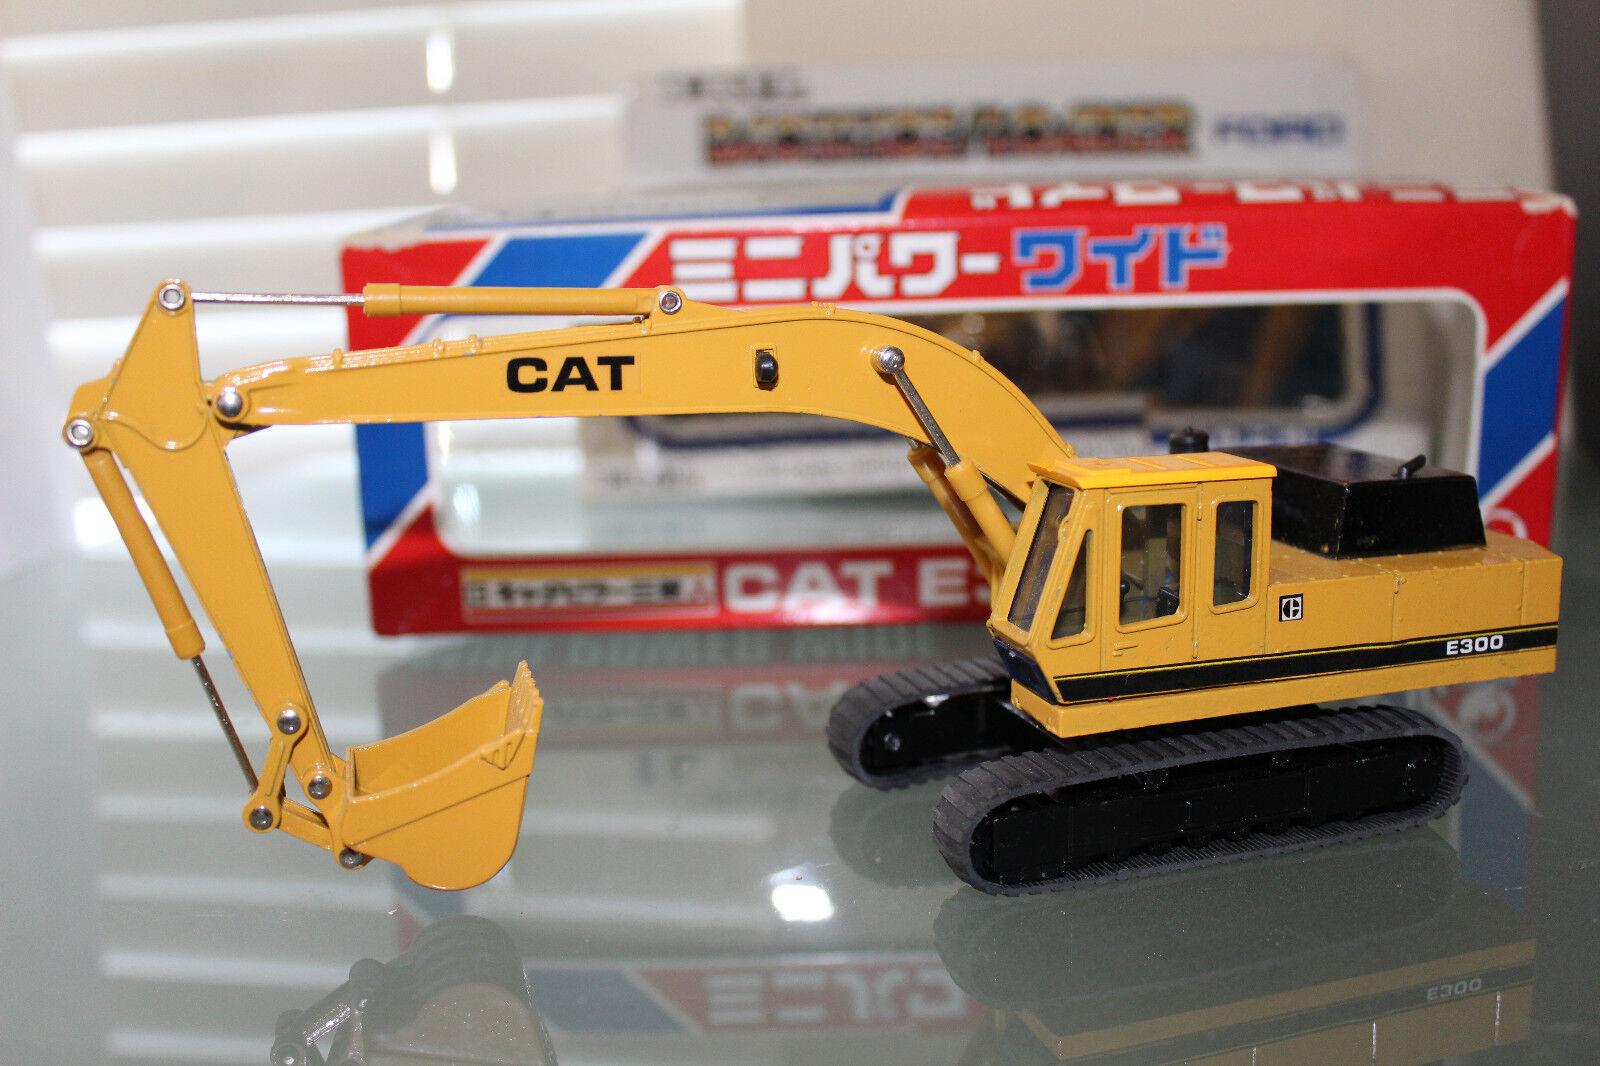 Shinsei escala 148 de excavadora hidráulica Cat E300 (Nº 606)